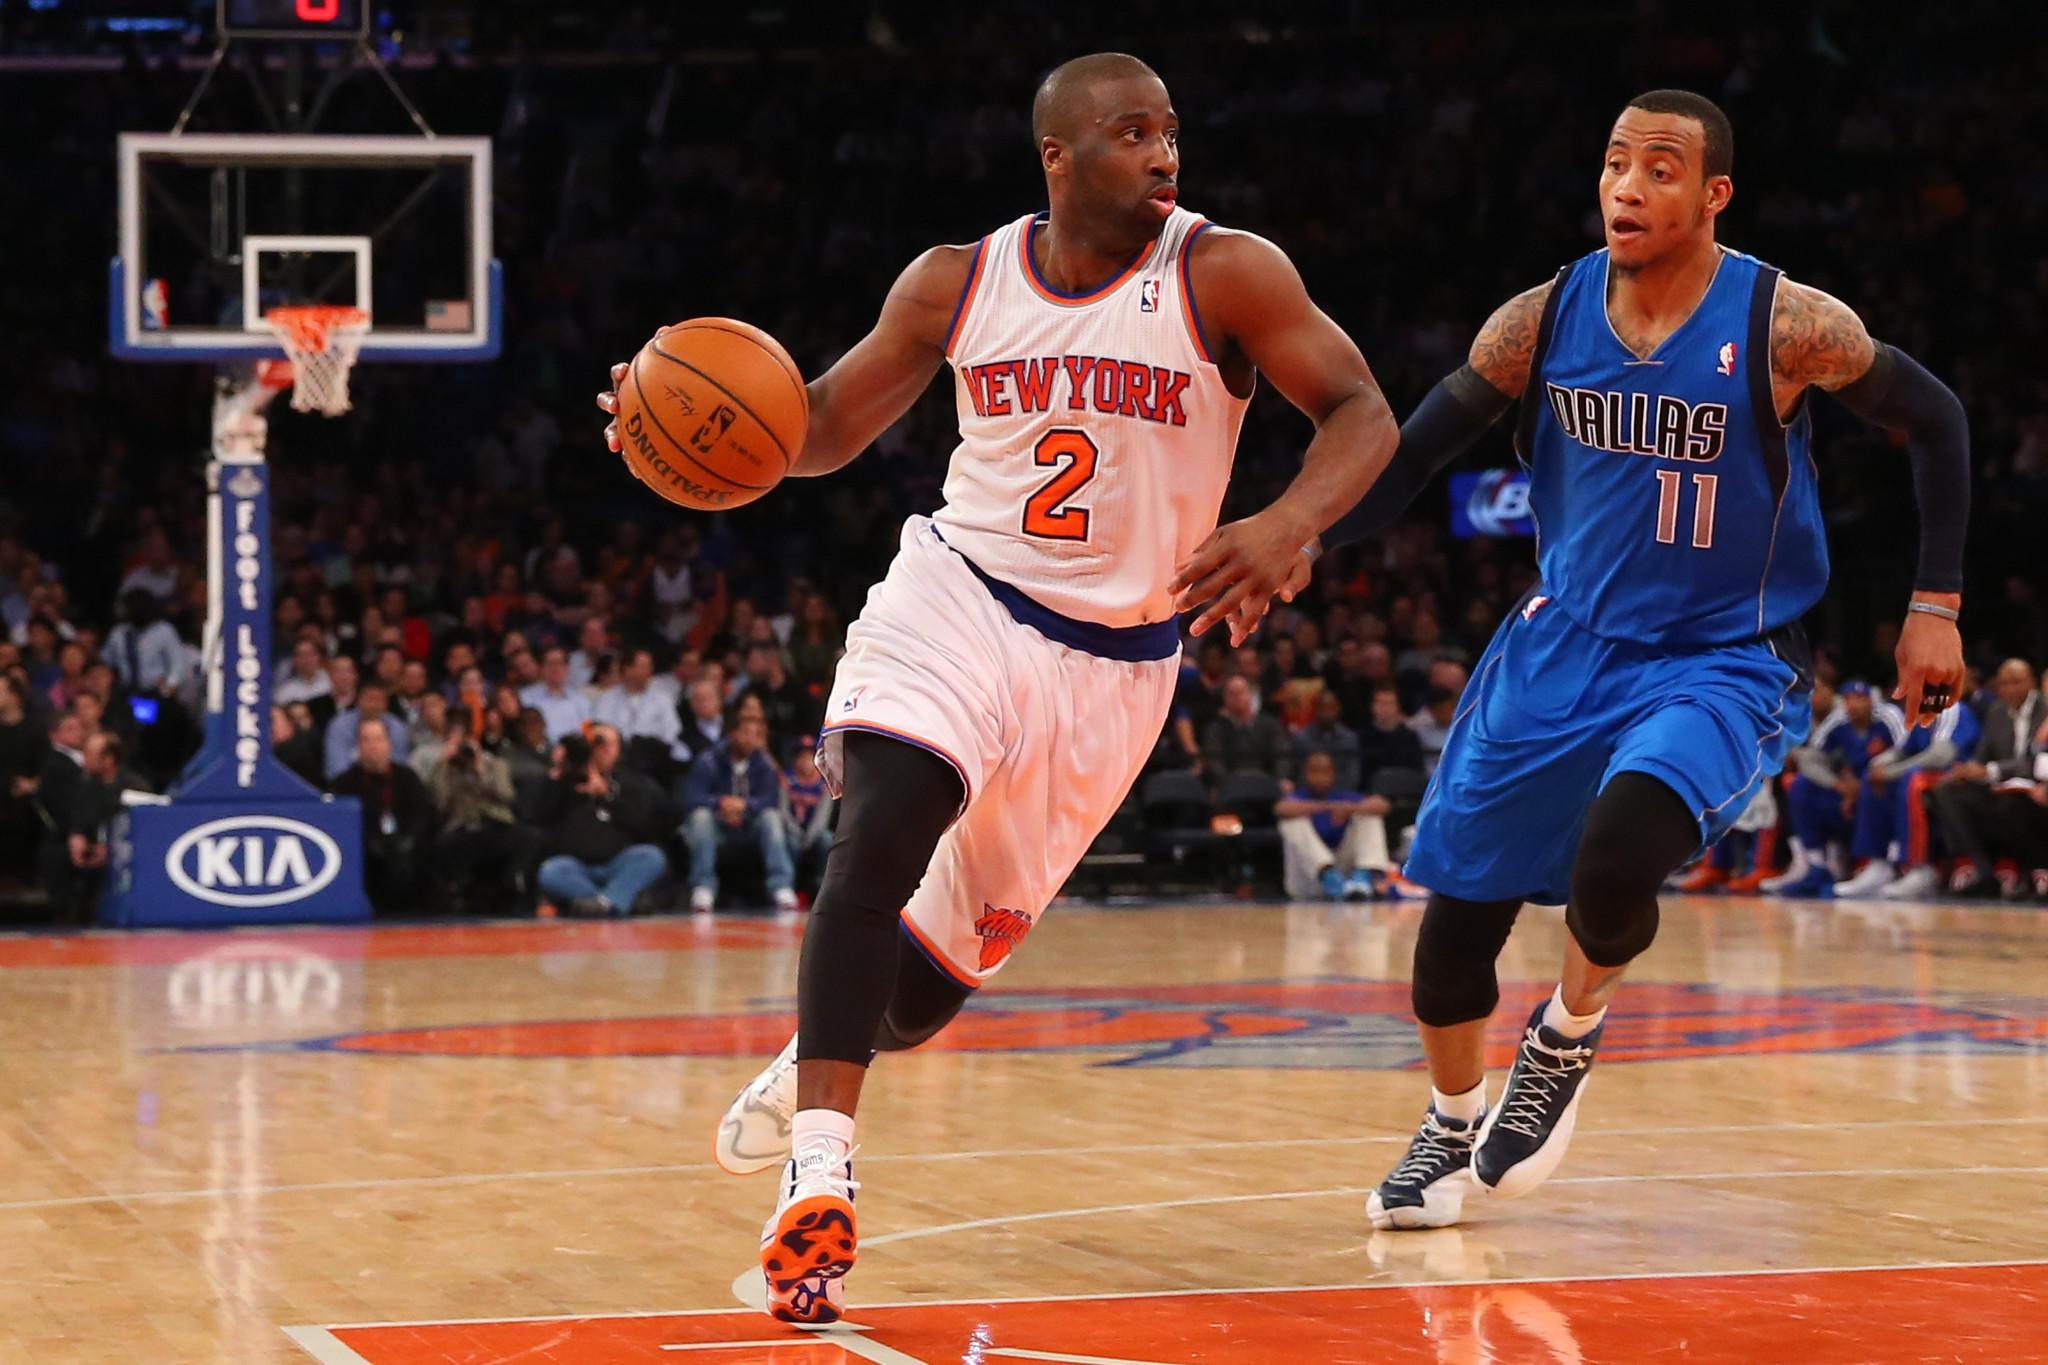 New York Knicks point guard Raymond Felton drives on Dallas Mavericks shooting guard Monta Ellis (11) during the third quarter at Madison Square Garden.